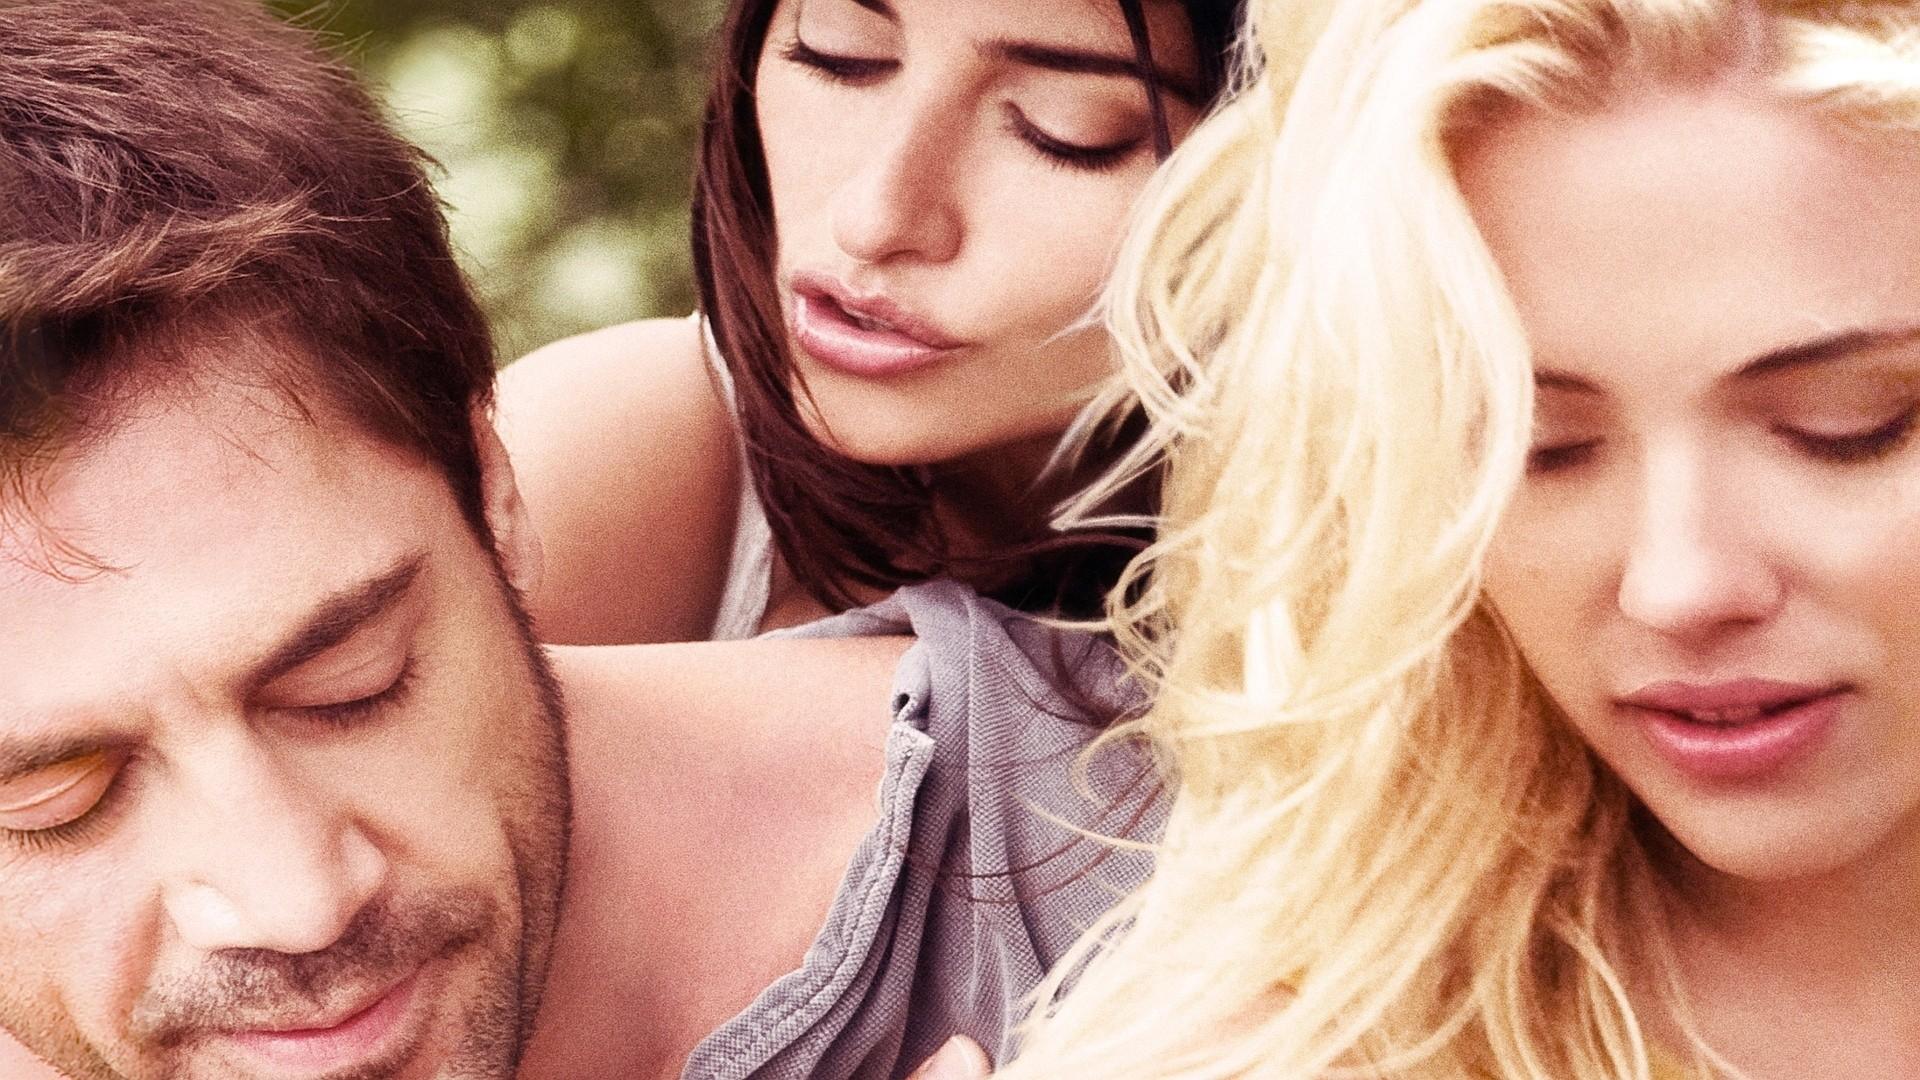 Vicky Cristina Barcelona Movie HD free download 720p